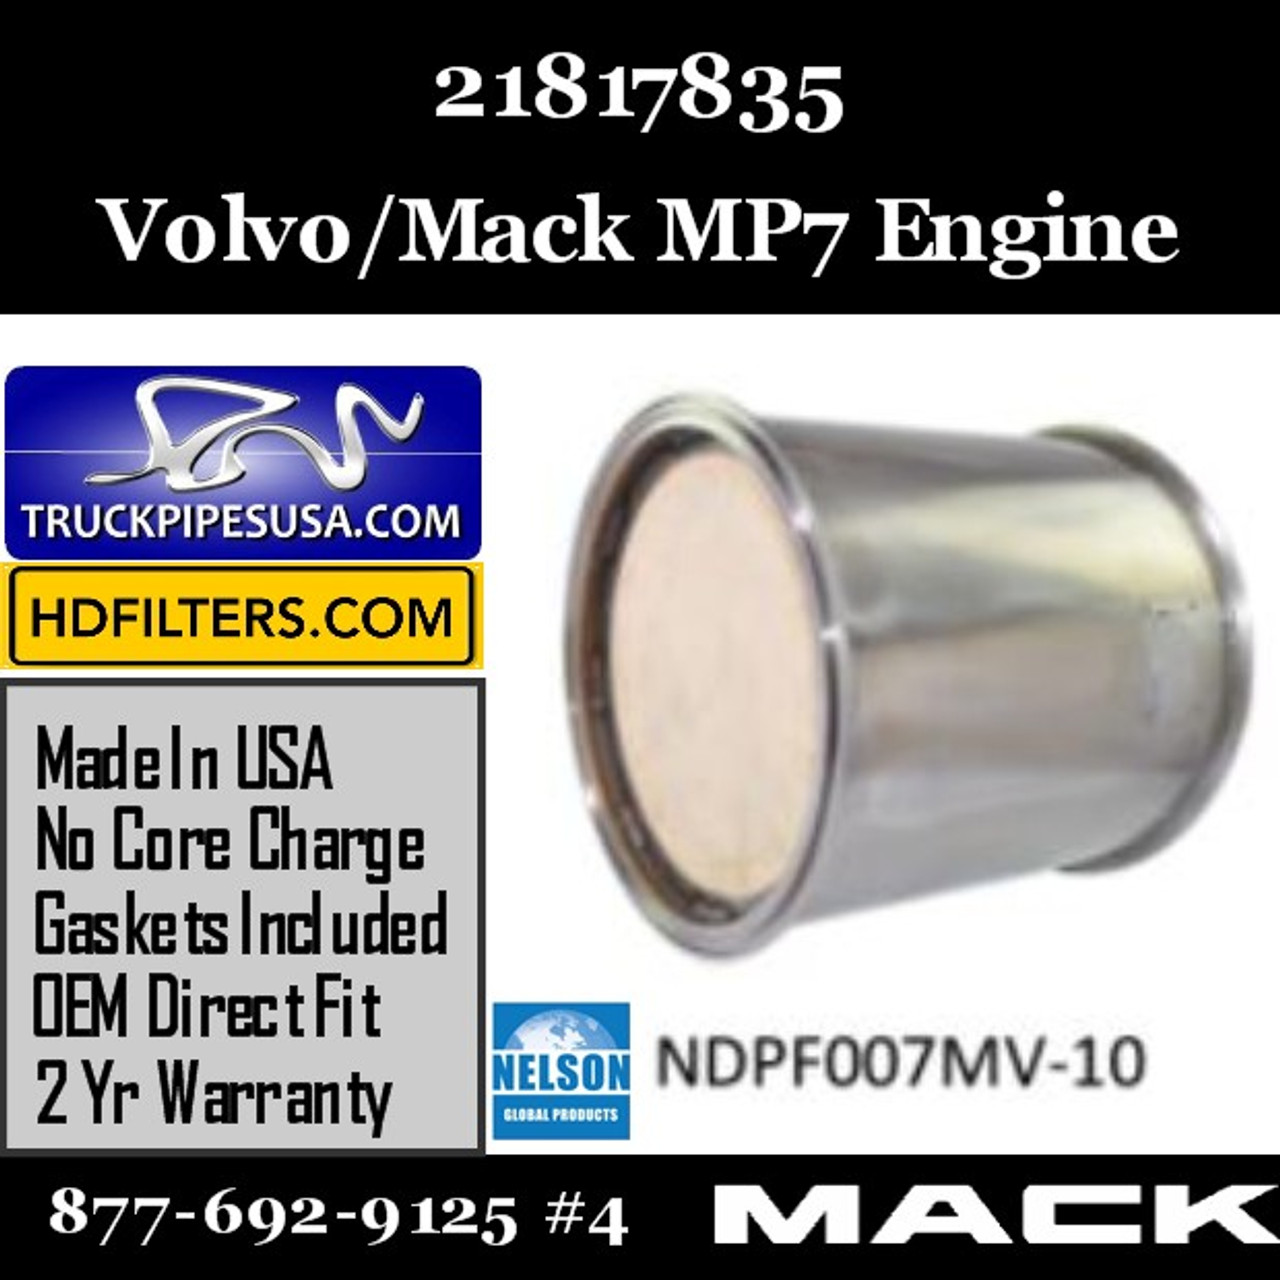 21817835 Volvo Mack DPF for MP7 Engine